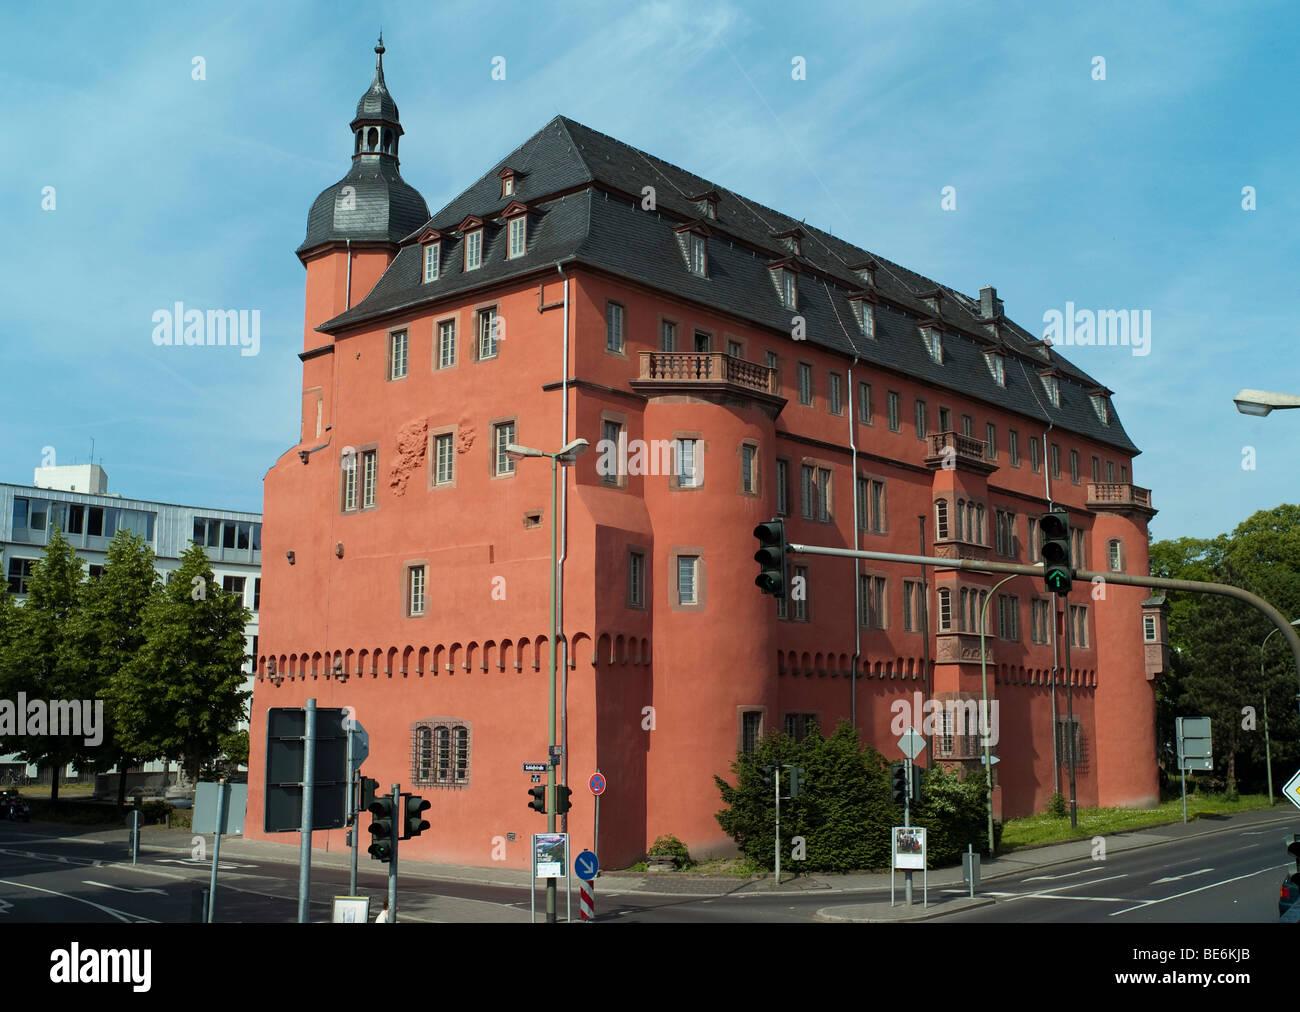 Gestaltung stockfotos gestaltung bilder alamy for Uni offenbach